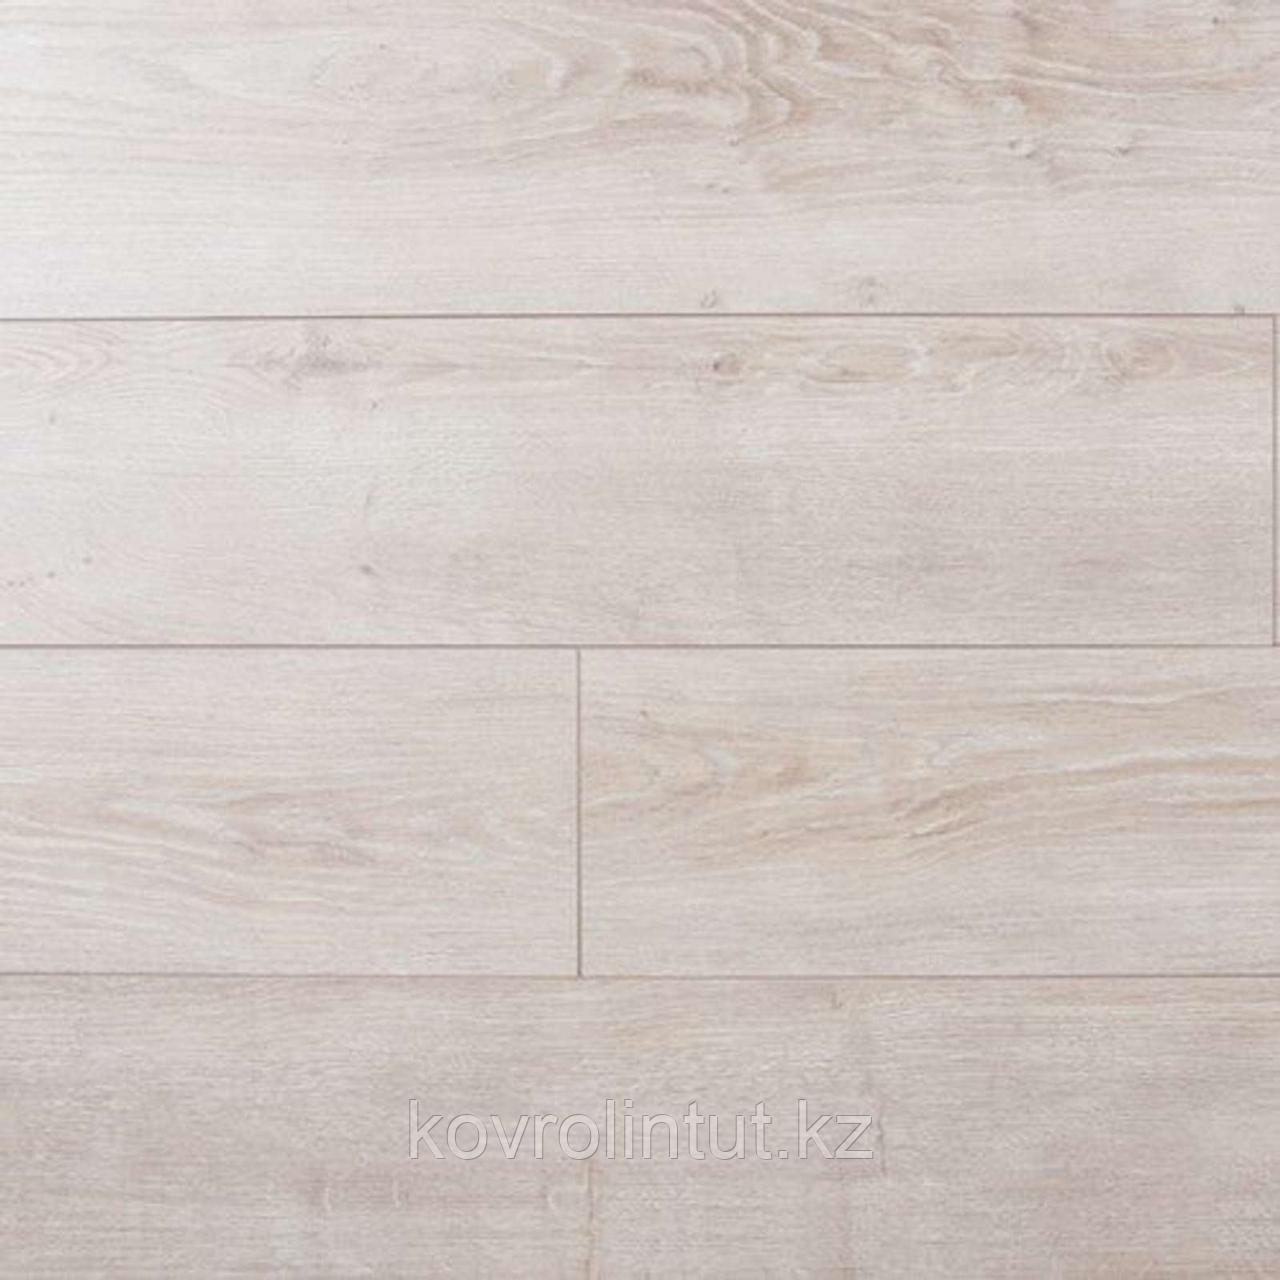 Ламинат Aurum Gusto Tamala Oak D4522